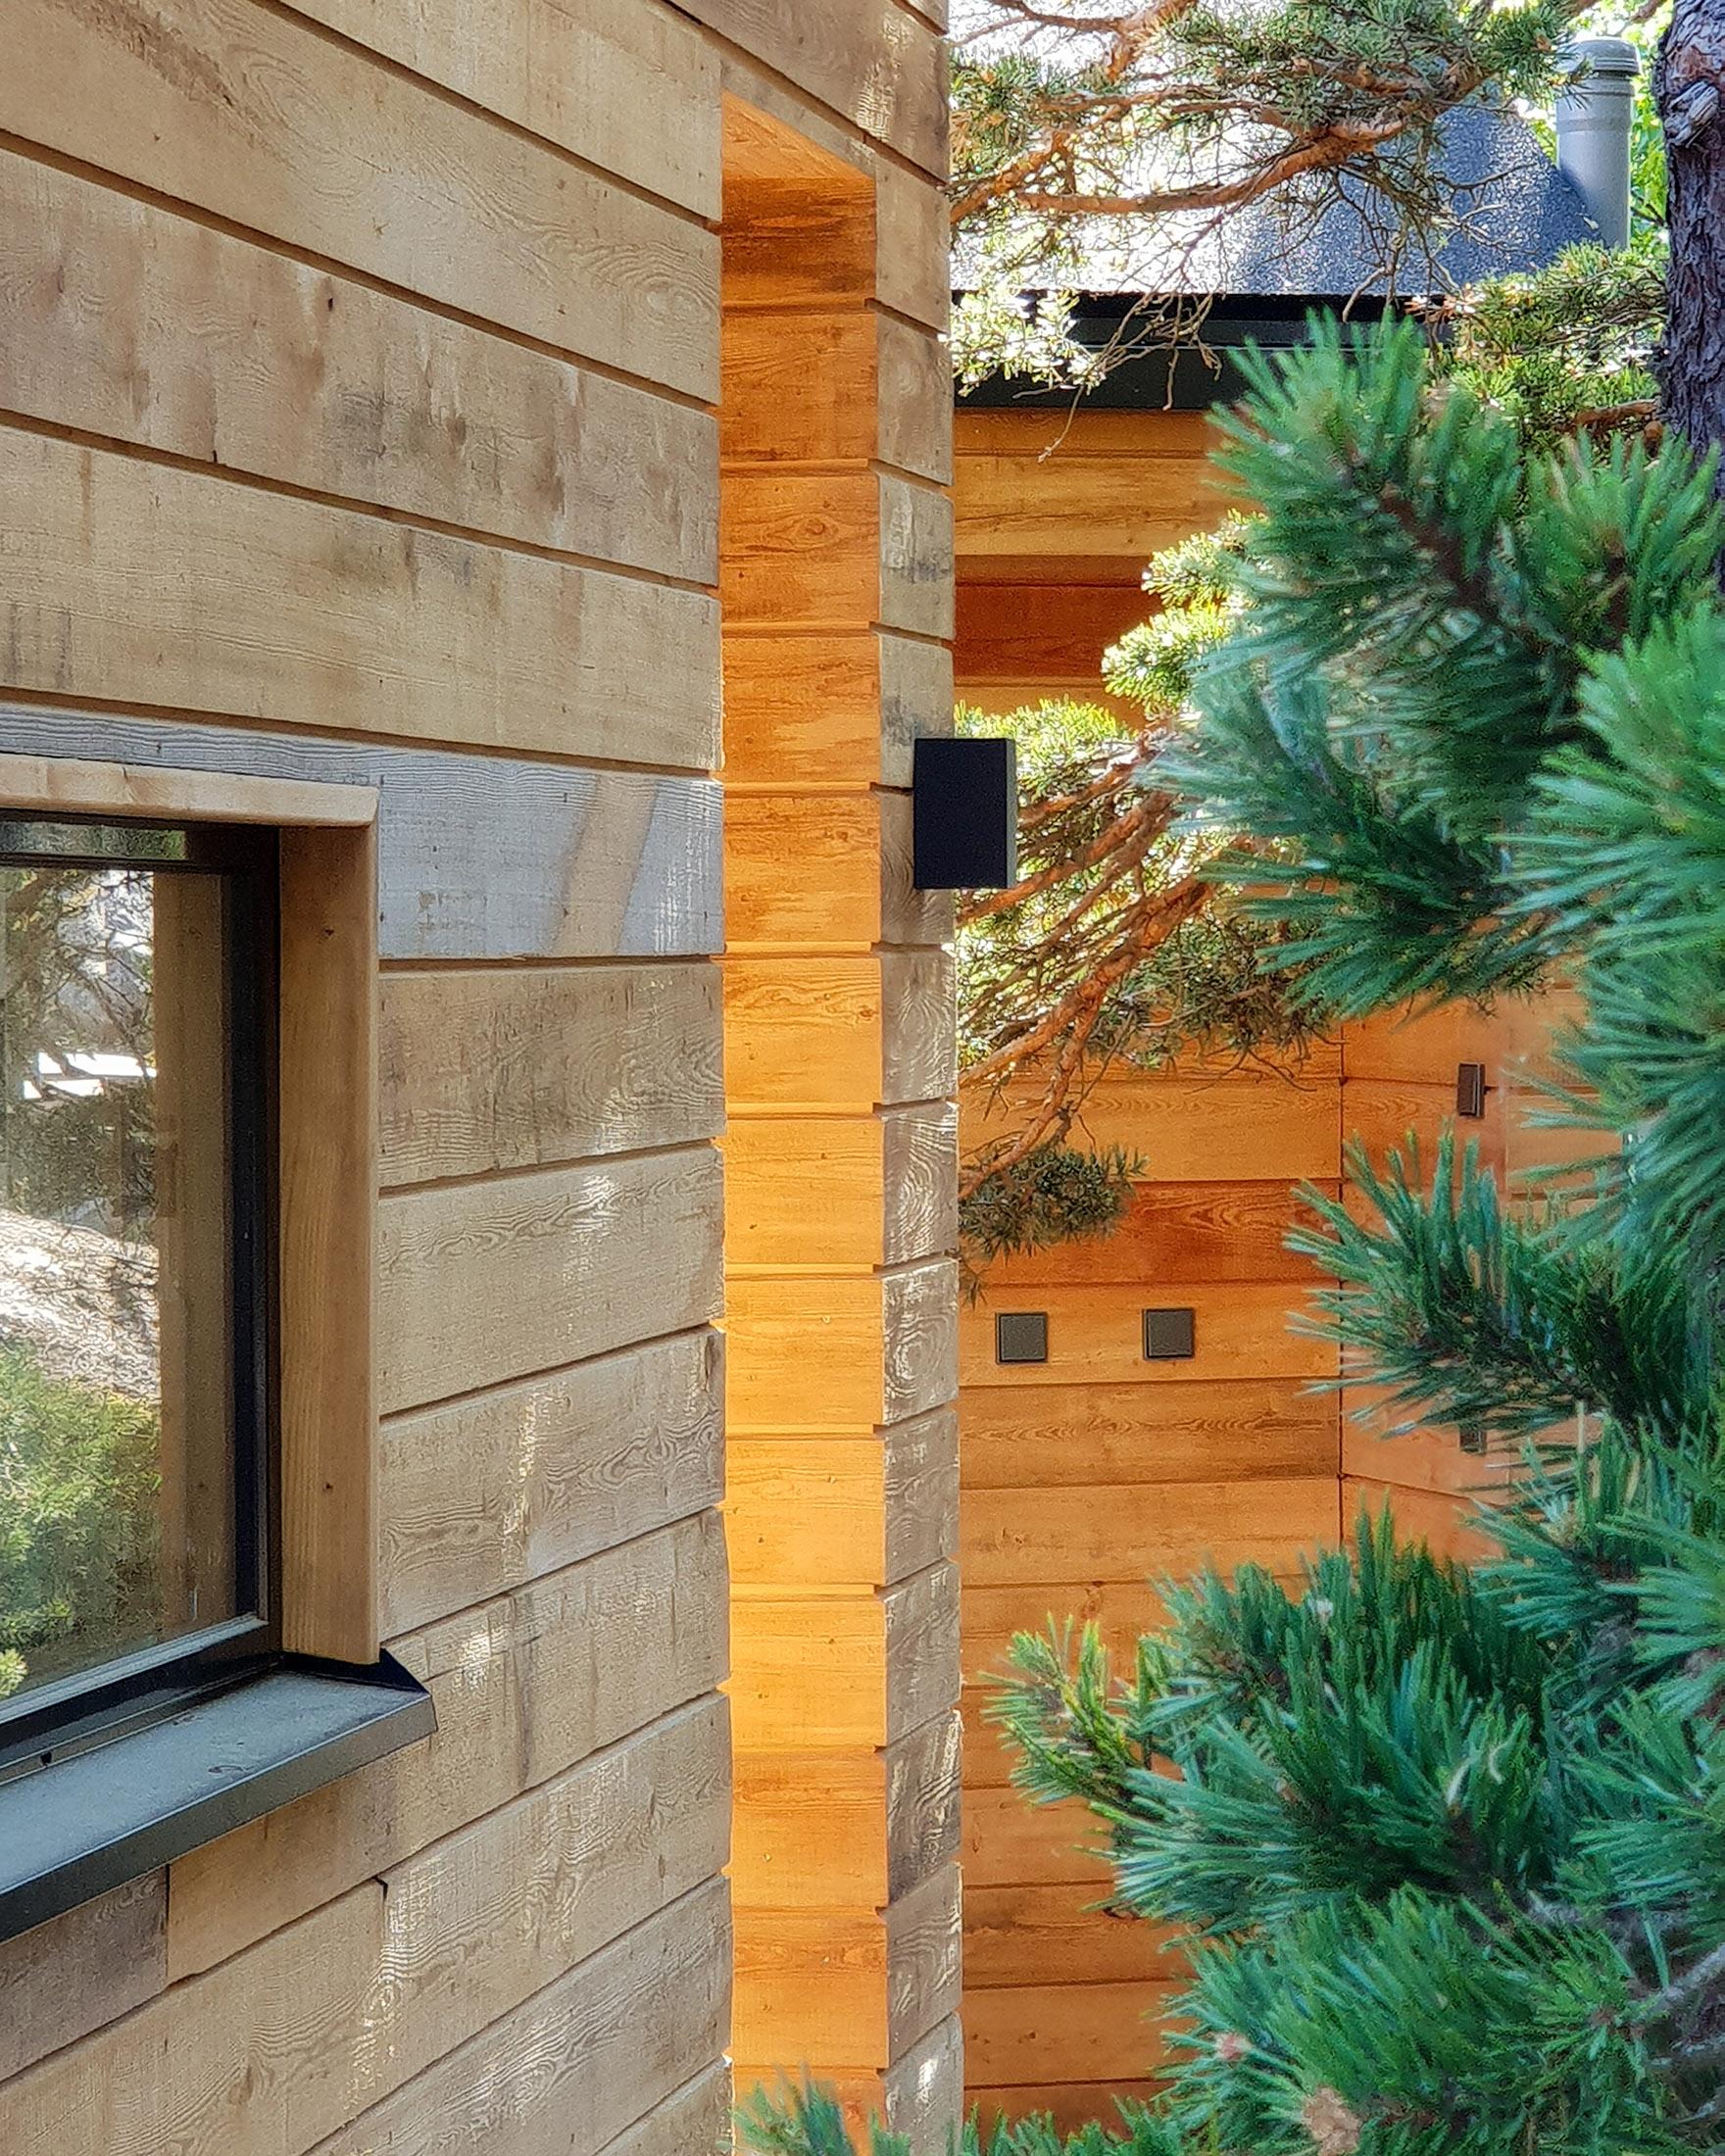 Kaunis-tupa-ja-sauna-Helsingin-saaristossa-3